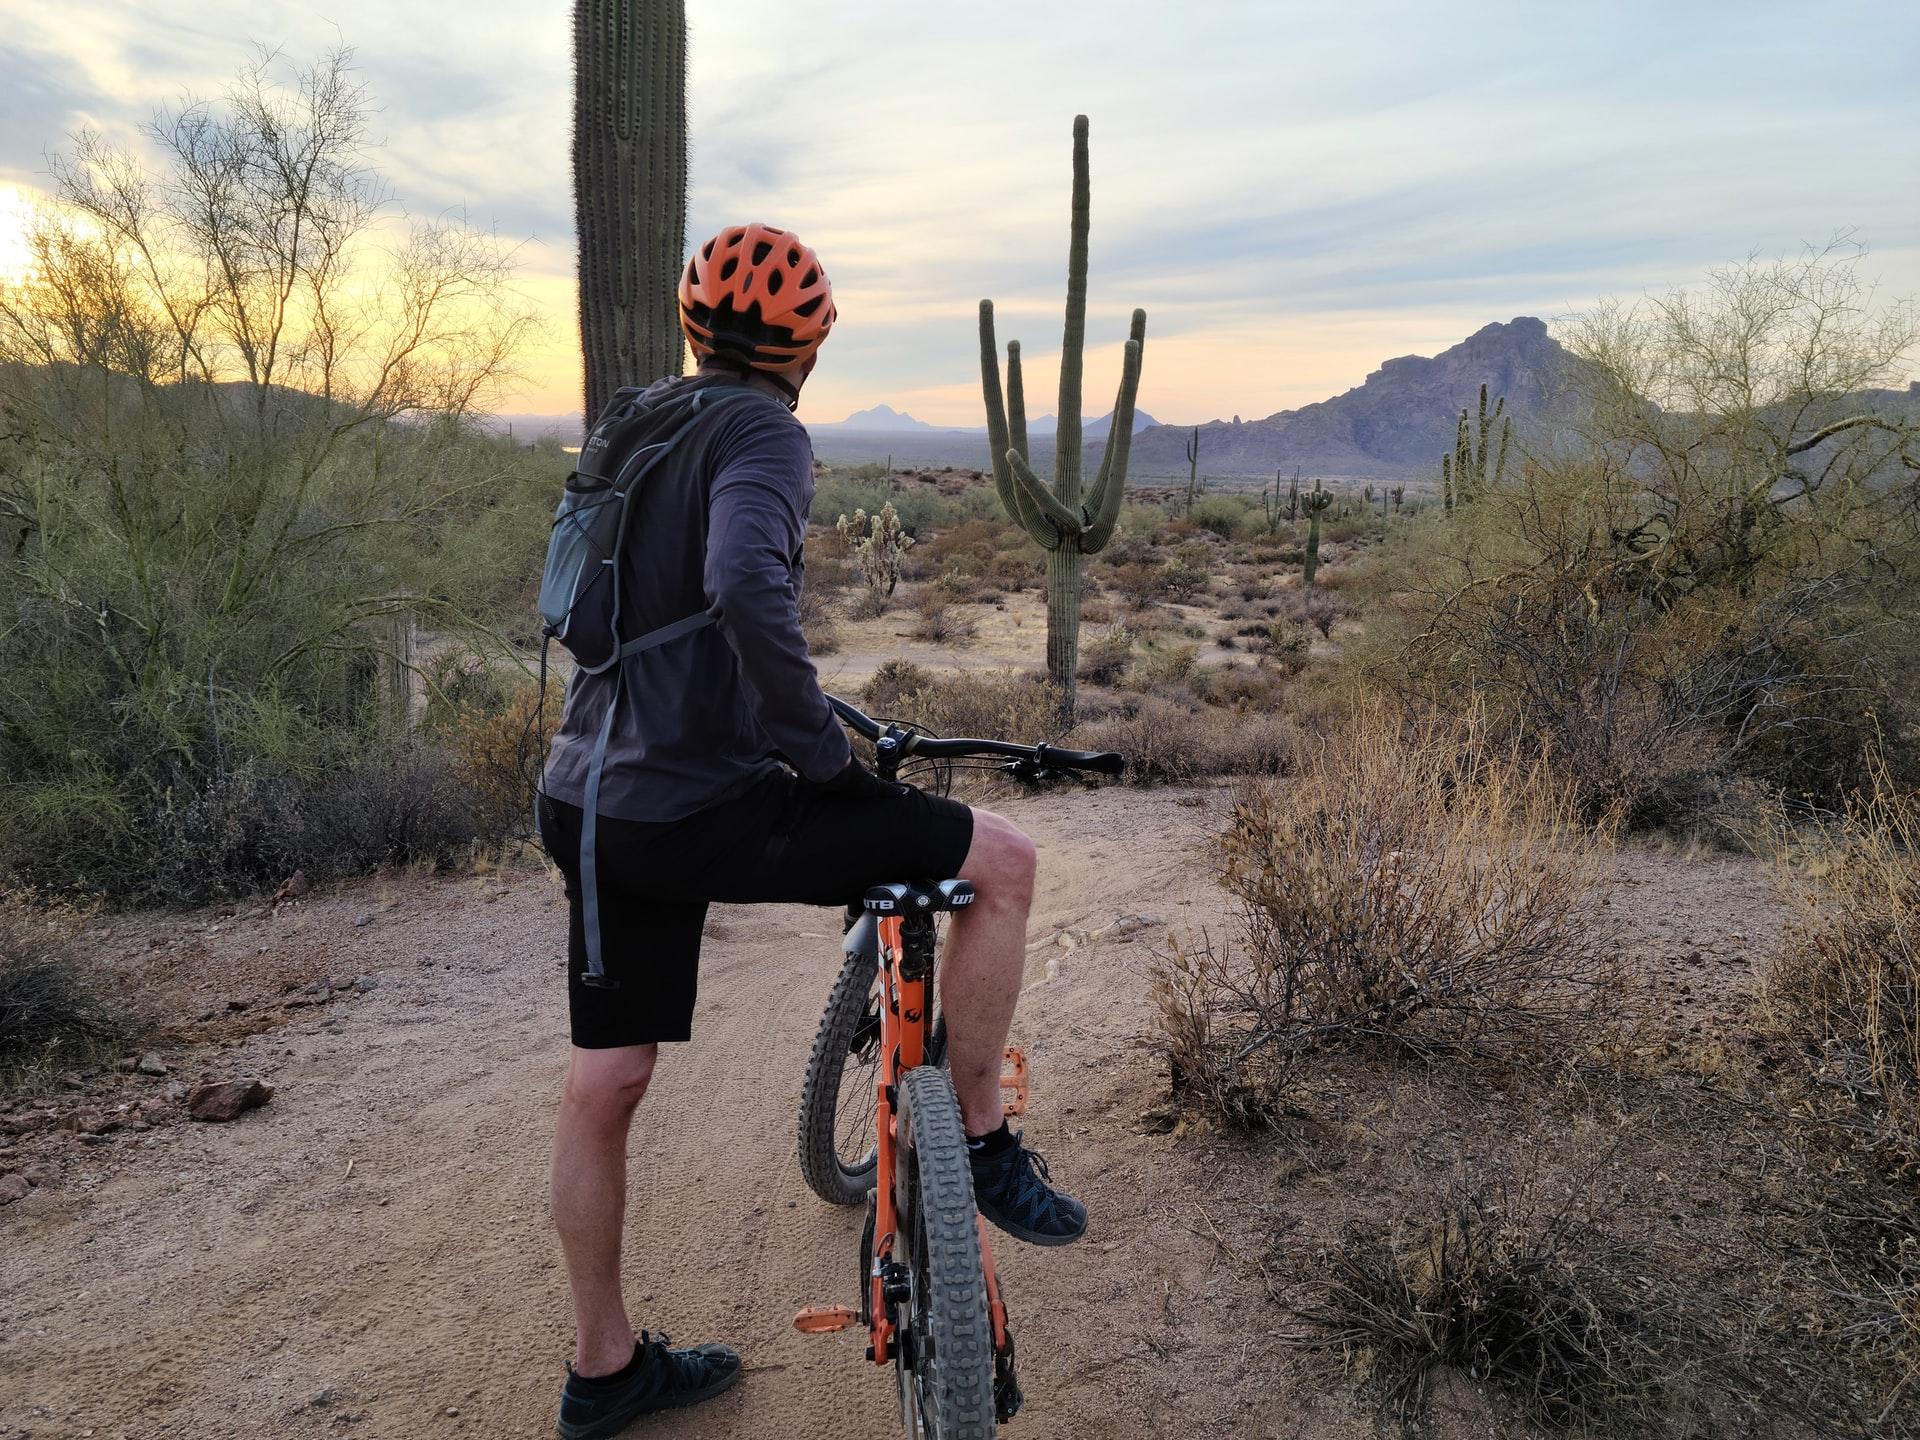 Man riding mouthain bike near Phoenix Arizona by Matthew Osborn on Unsplash